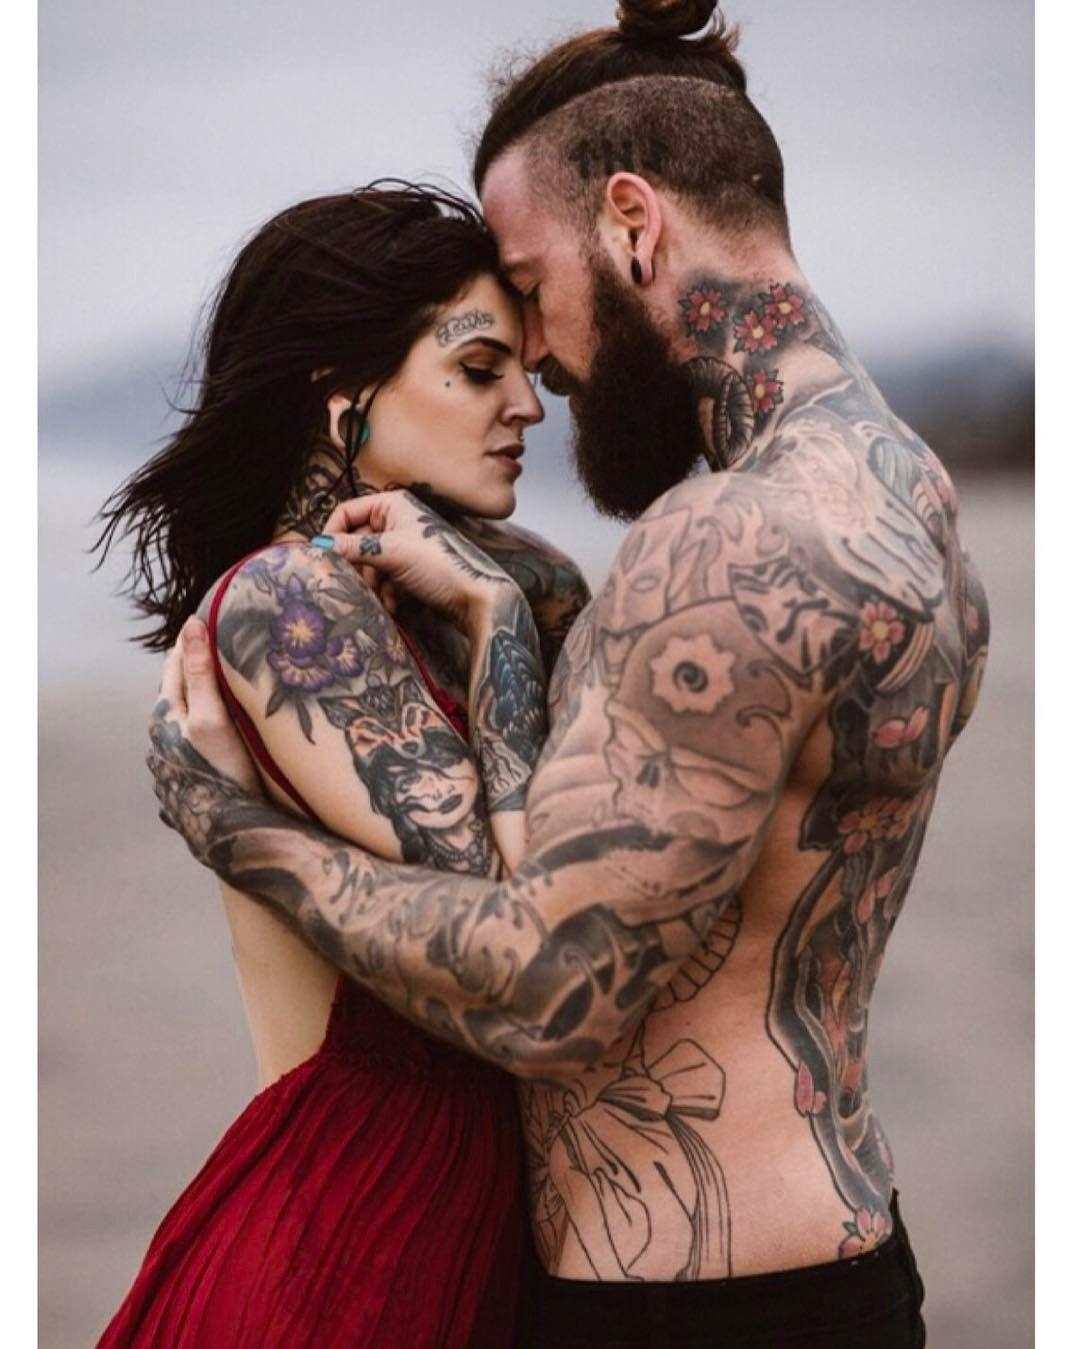 Hot husband and wife tattoo